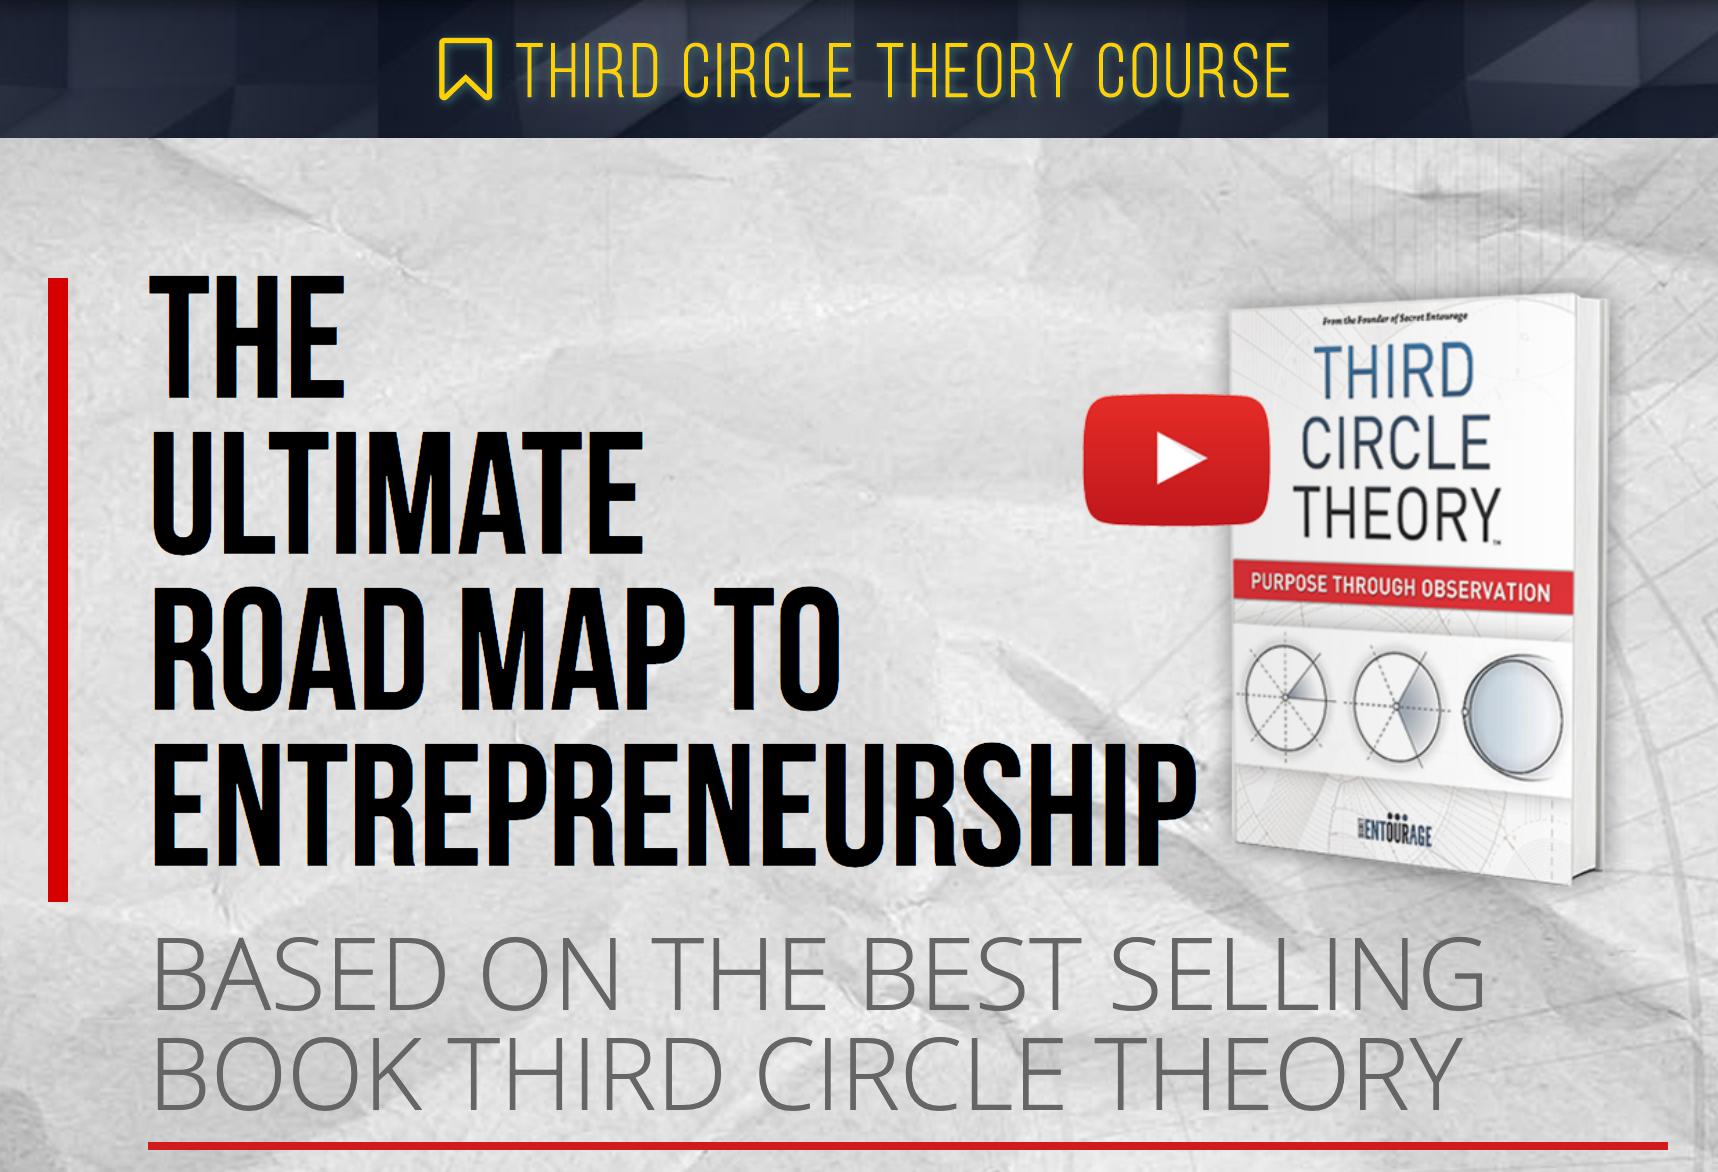 Third Circle Theory Course – Secret Entourage Academy